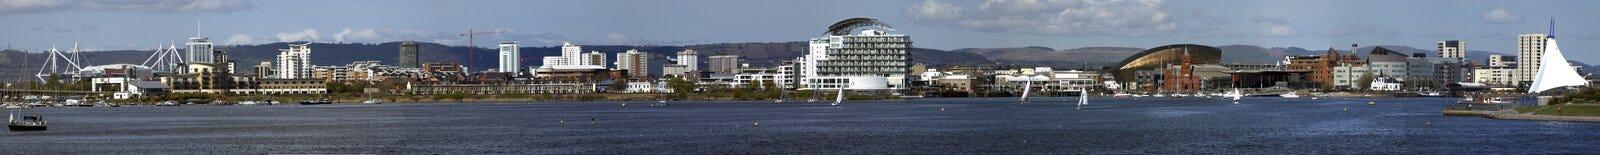 Baía de Cardiff Imagens de Stock Royalty Free